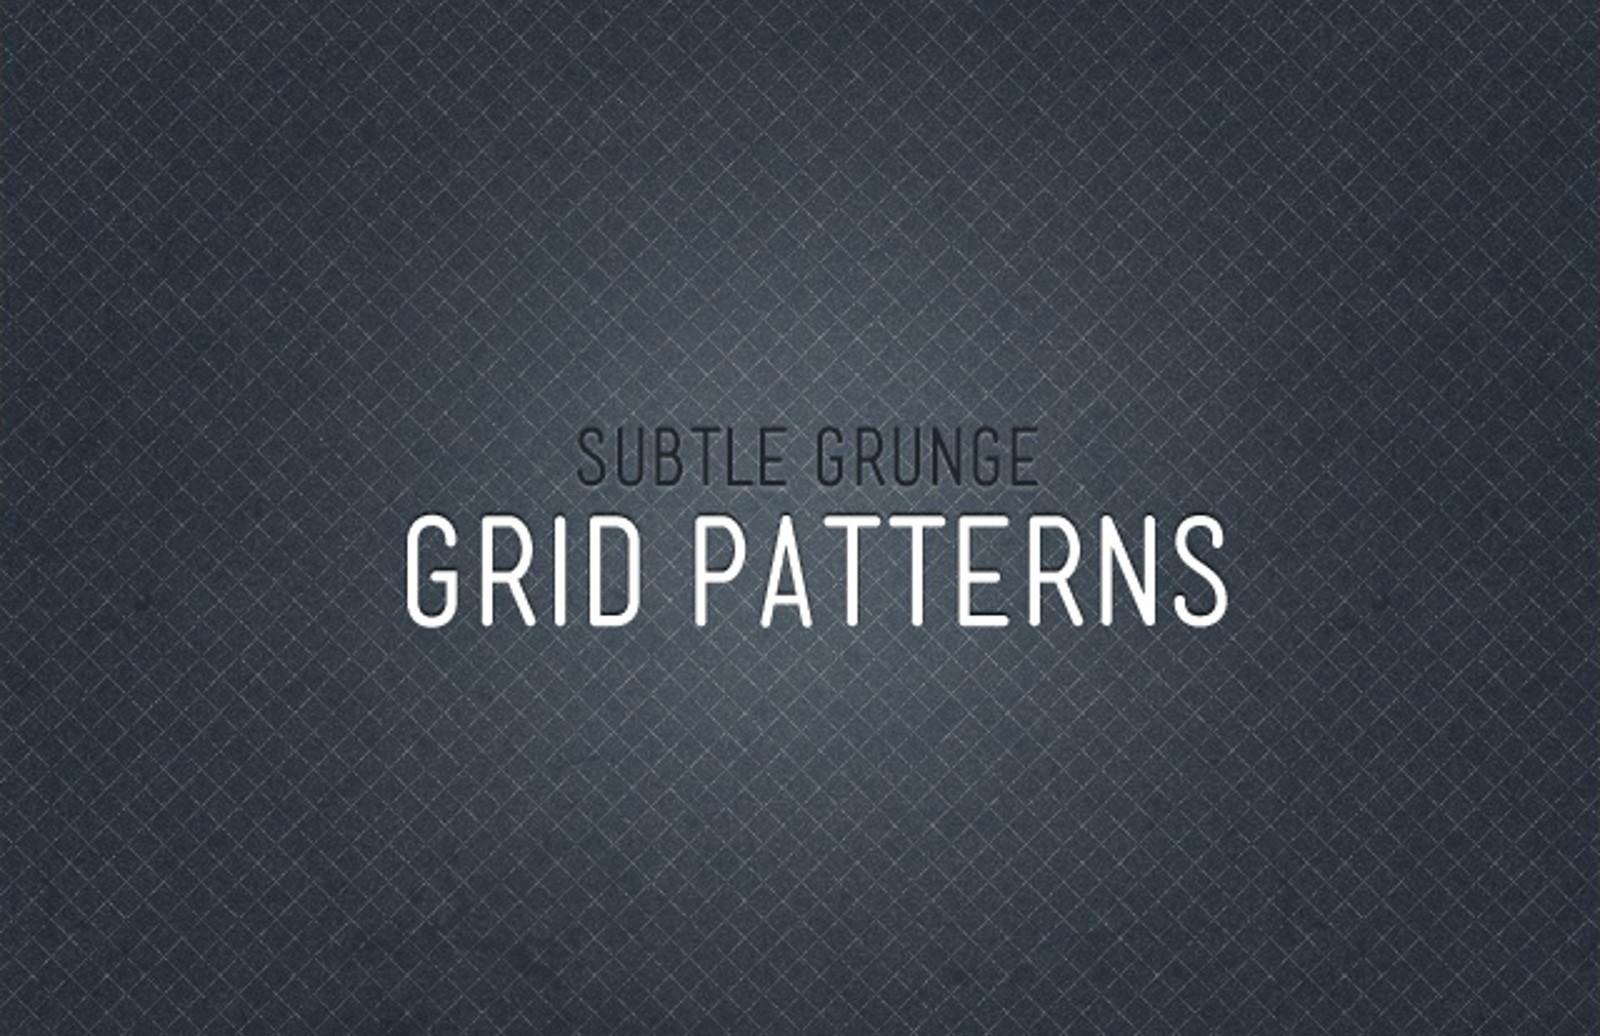 Subtle  Grunge  Grid  Patterns  Preview11